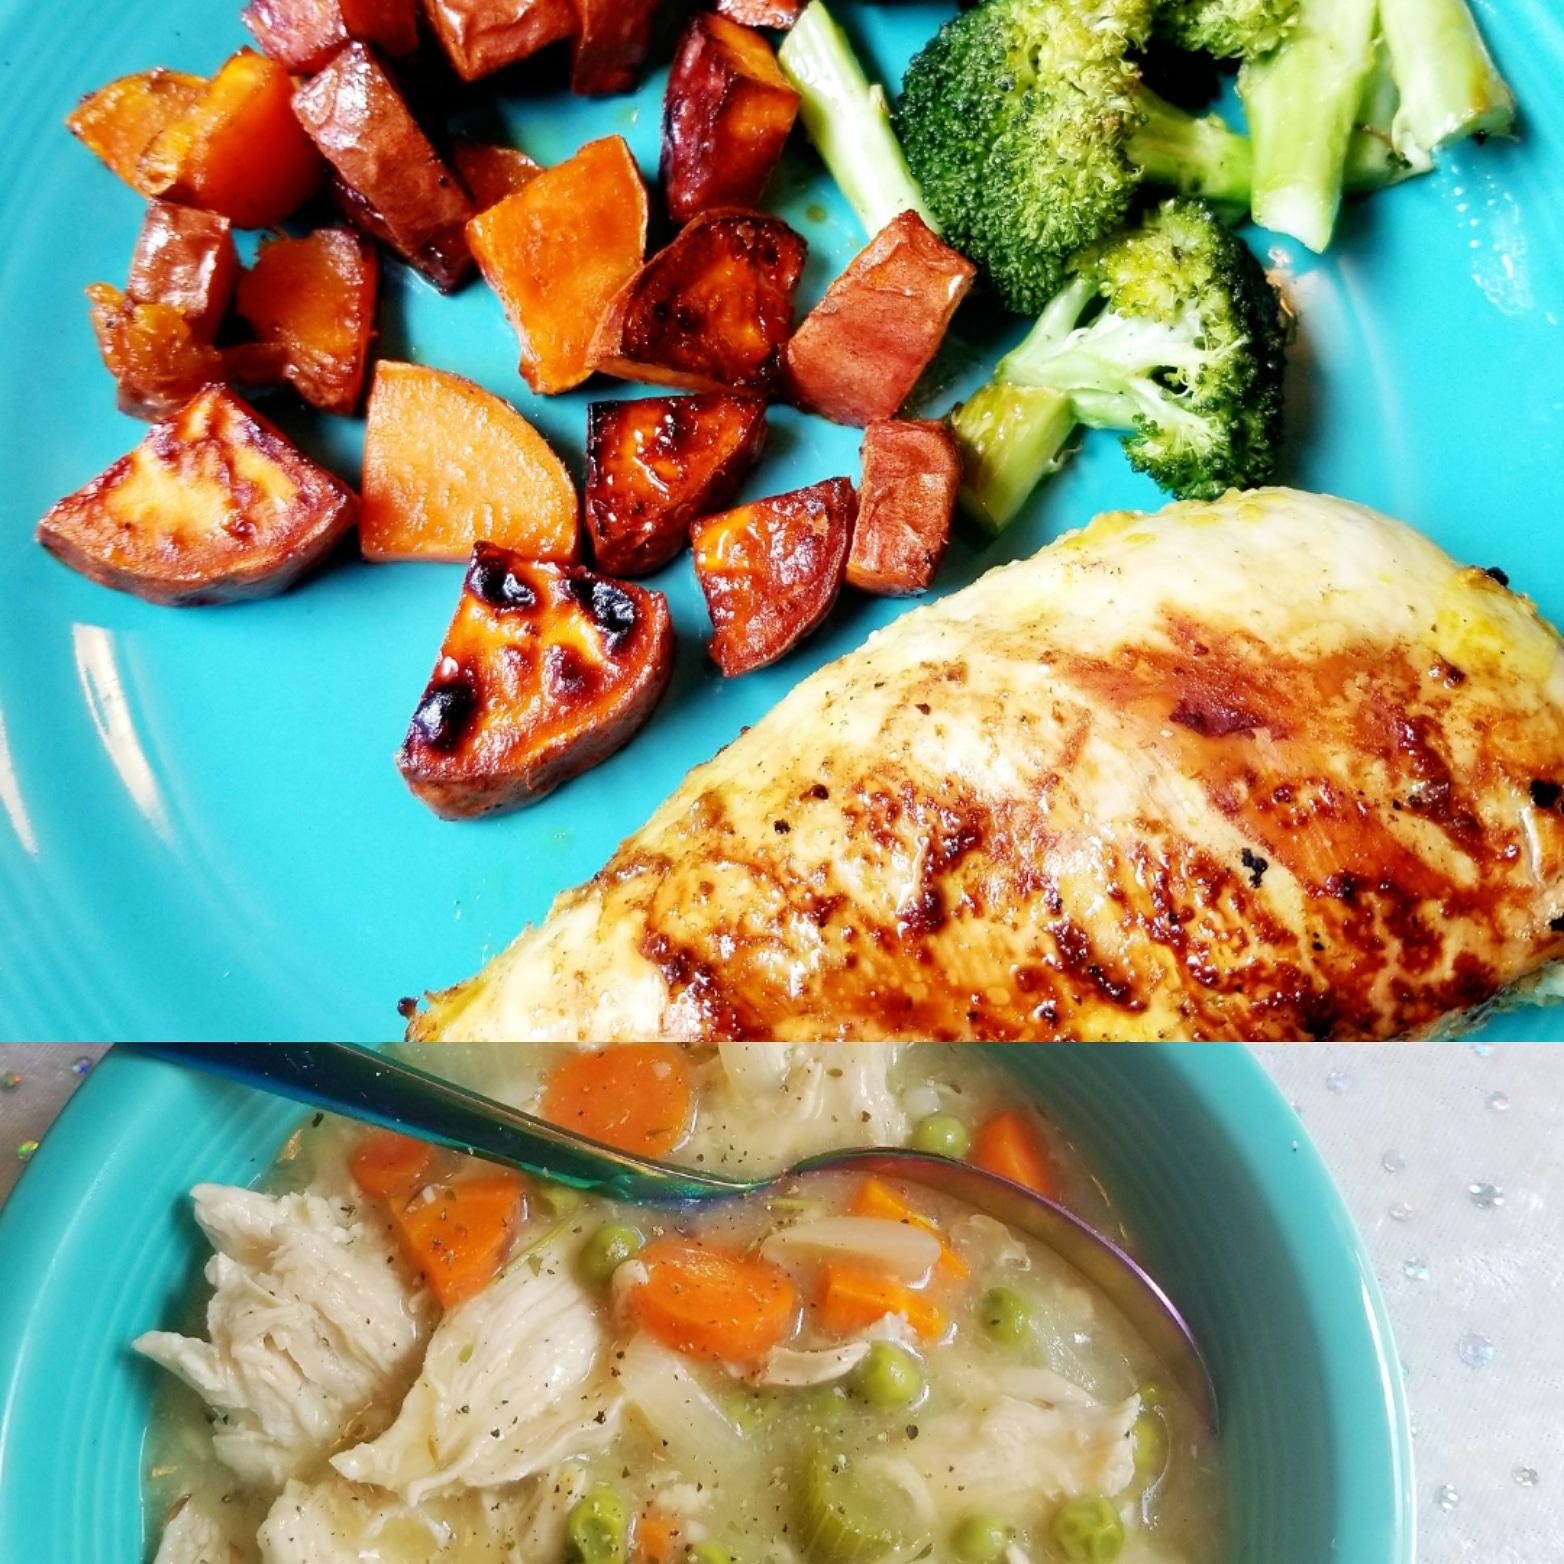 img 20180831 094211 976 - Gluten-Free Paleo-ish Chicken Potpie Soup and Paleo Lemon Turmeric Chicken - How I Created It